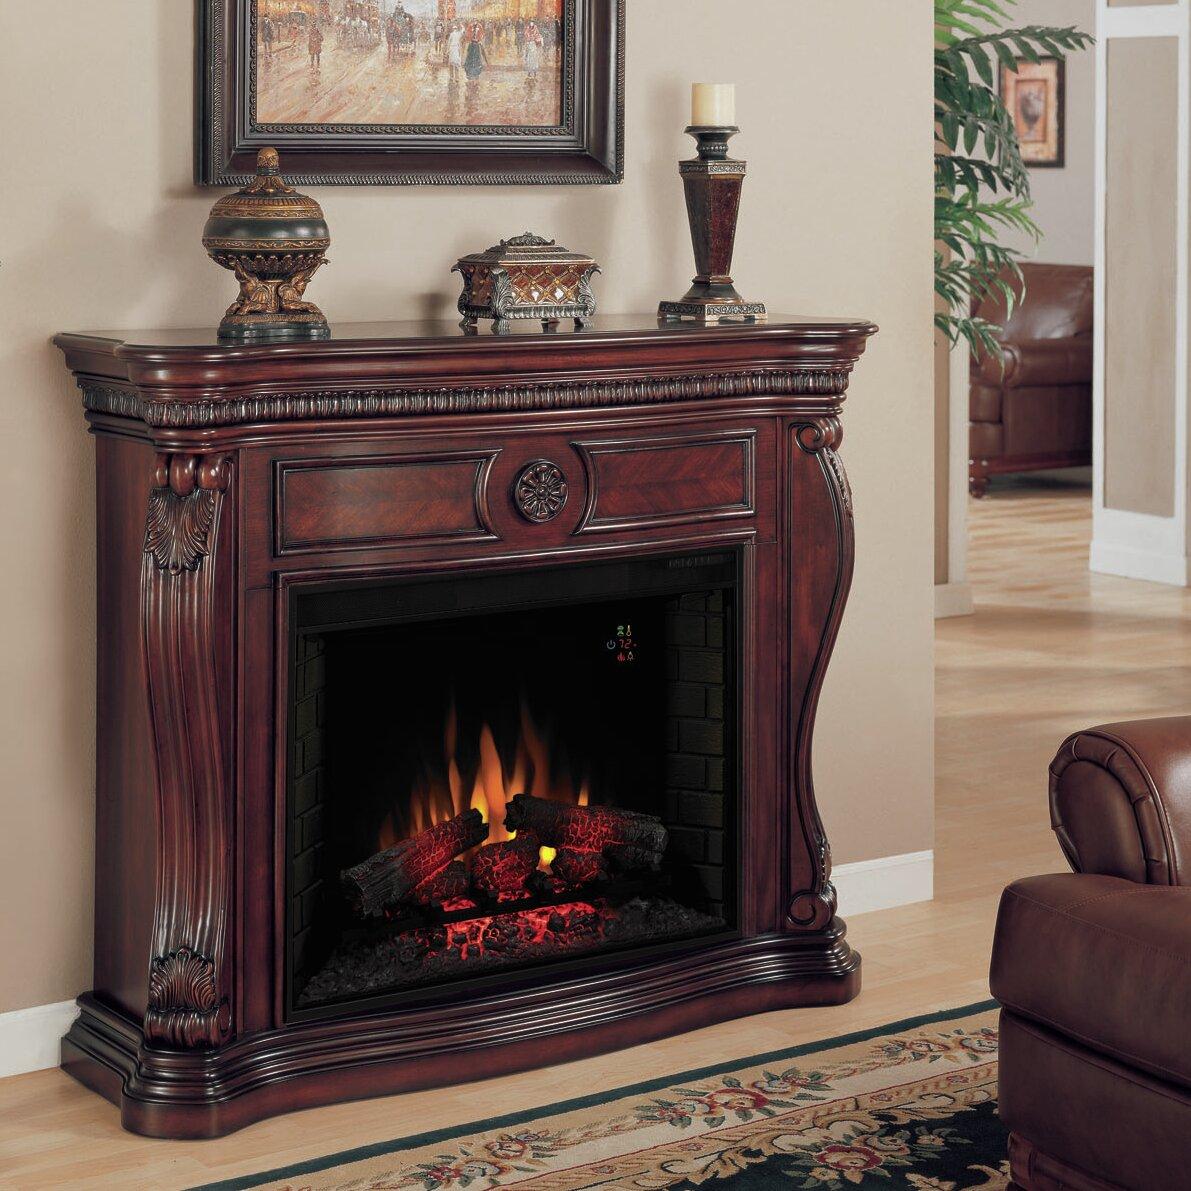 Classic Flame Lexington Electric Fireplace Mantel Surround - Classic Flame Lexington Electric Fireplace Mantel Surround